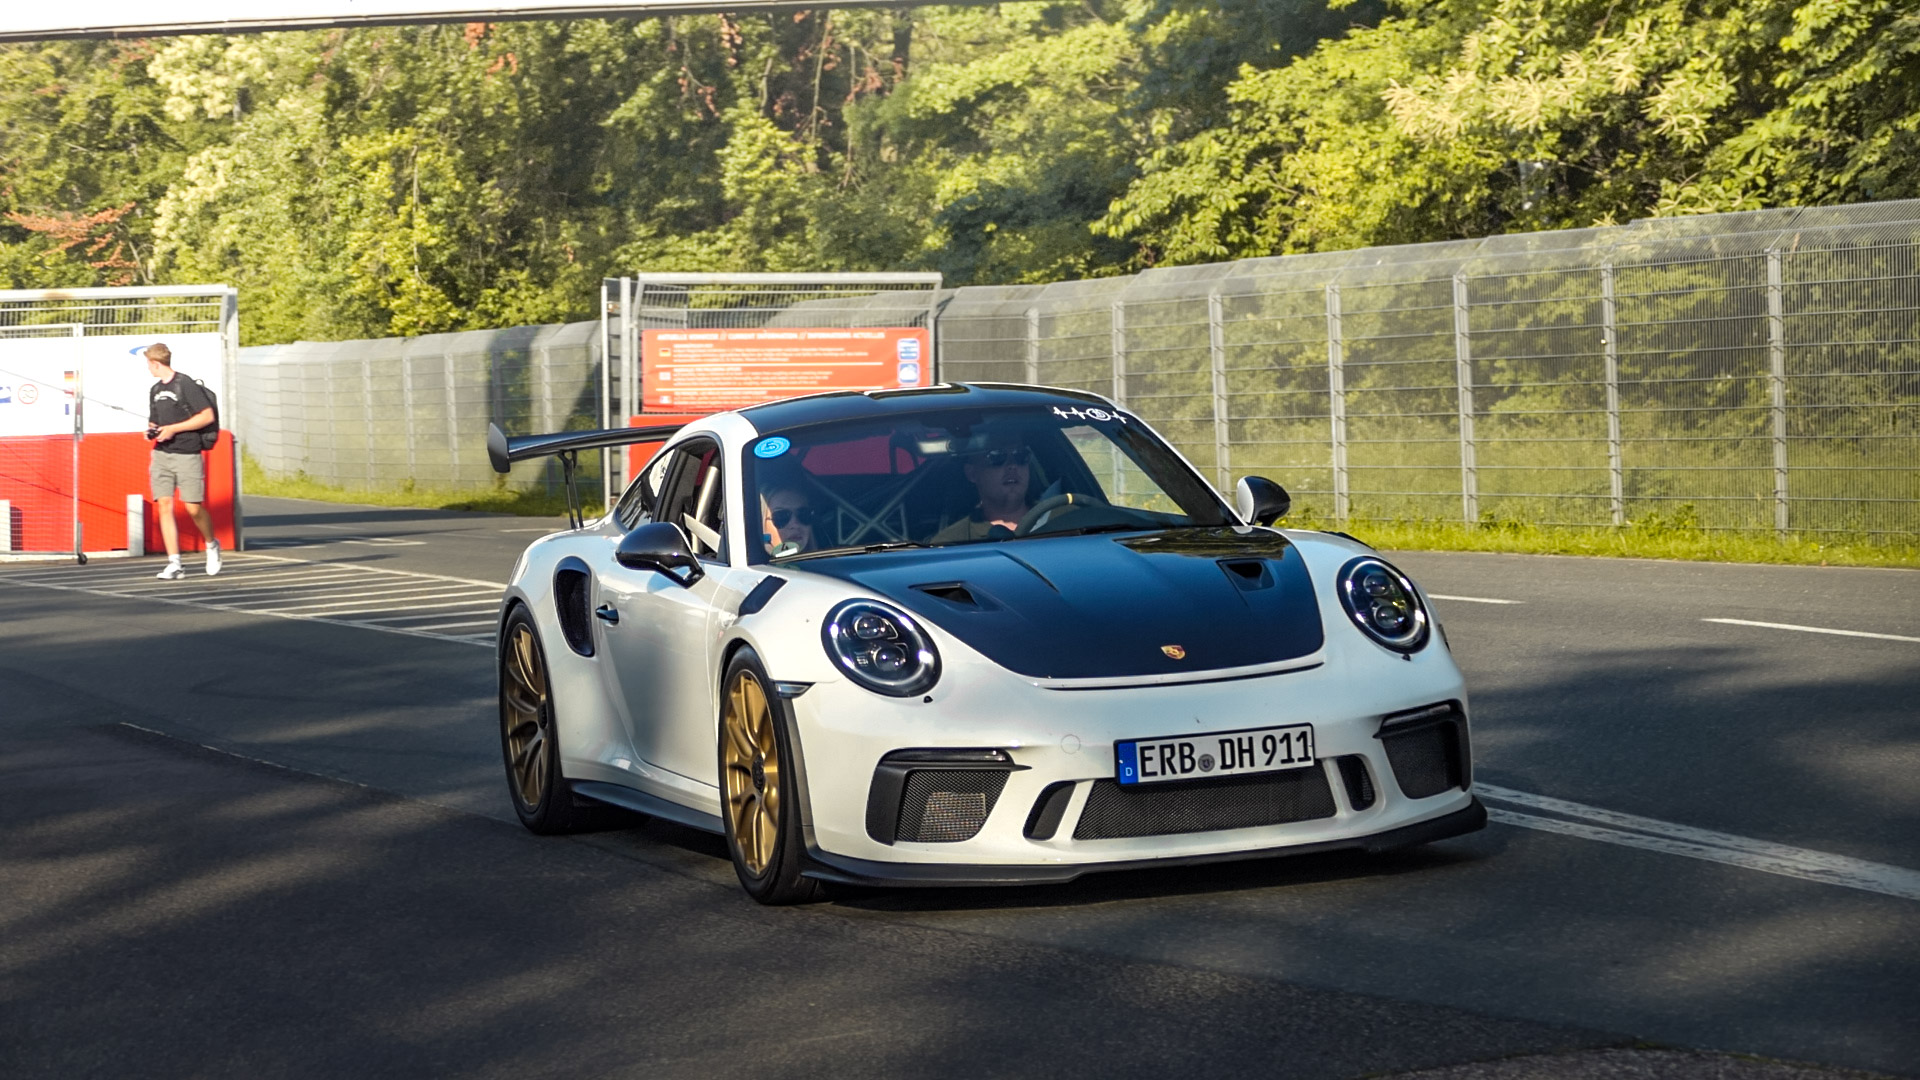 Porsche 911 991.2 GT3 RS - ERB-DH-911